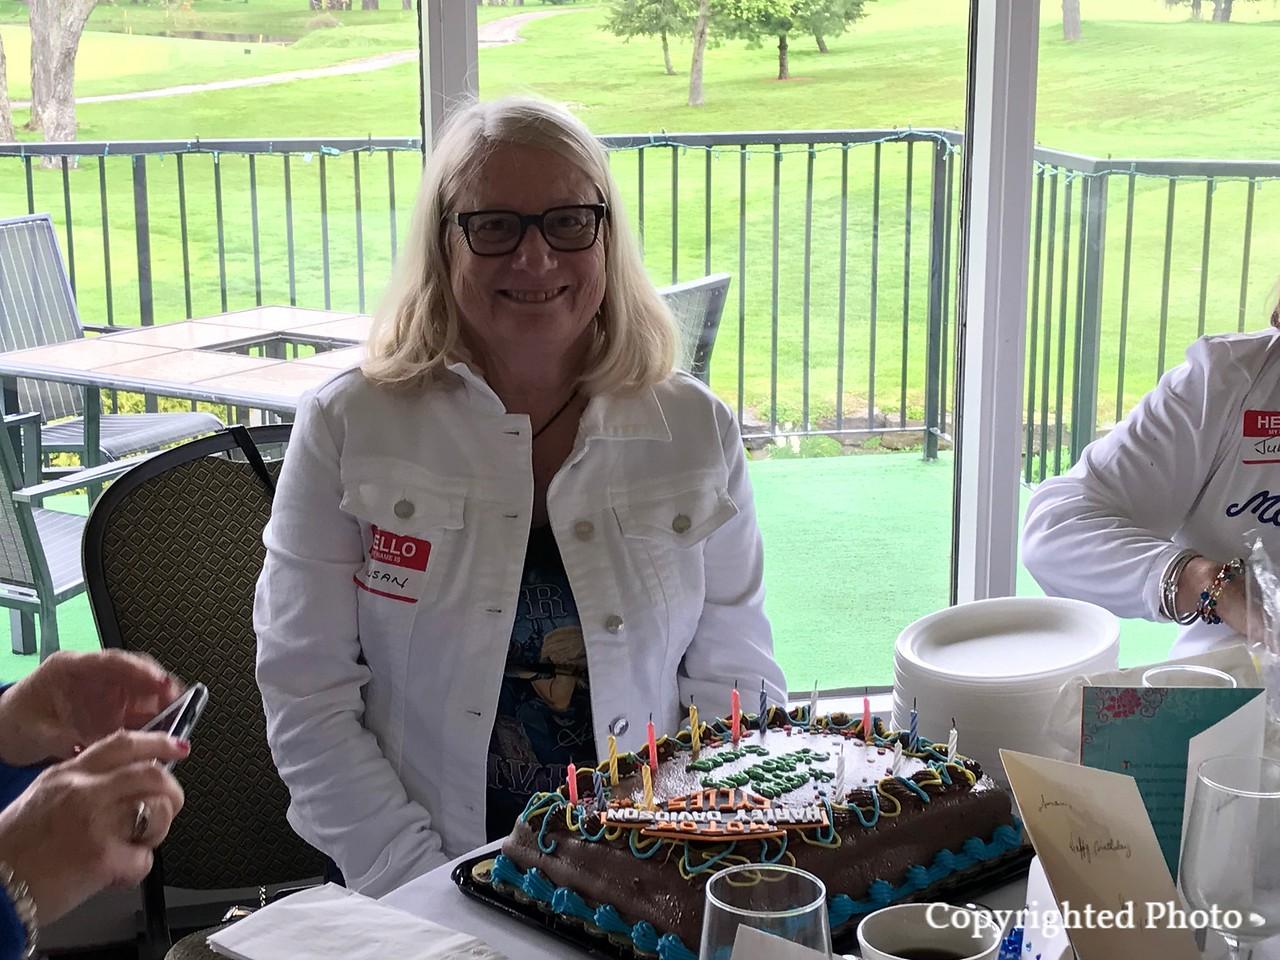 Susan Leslie the birthday girl!